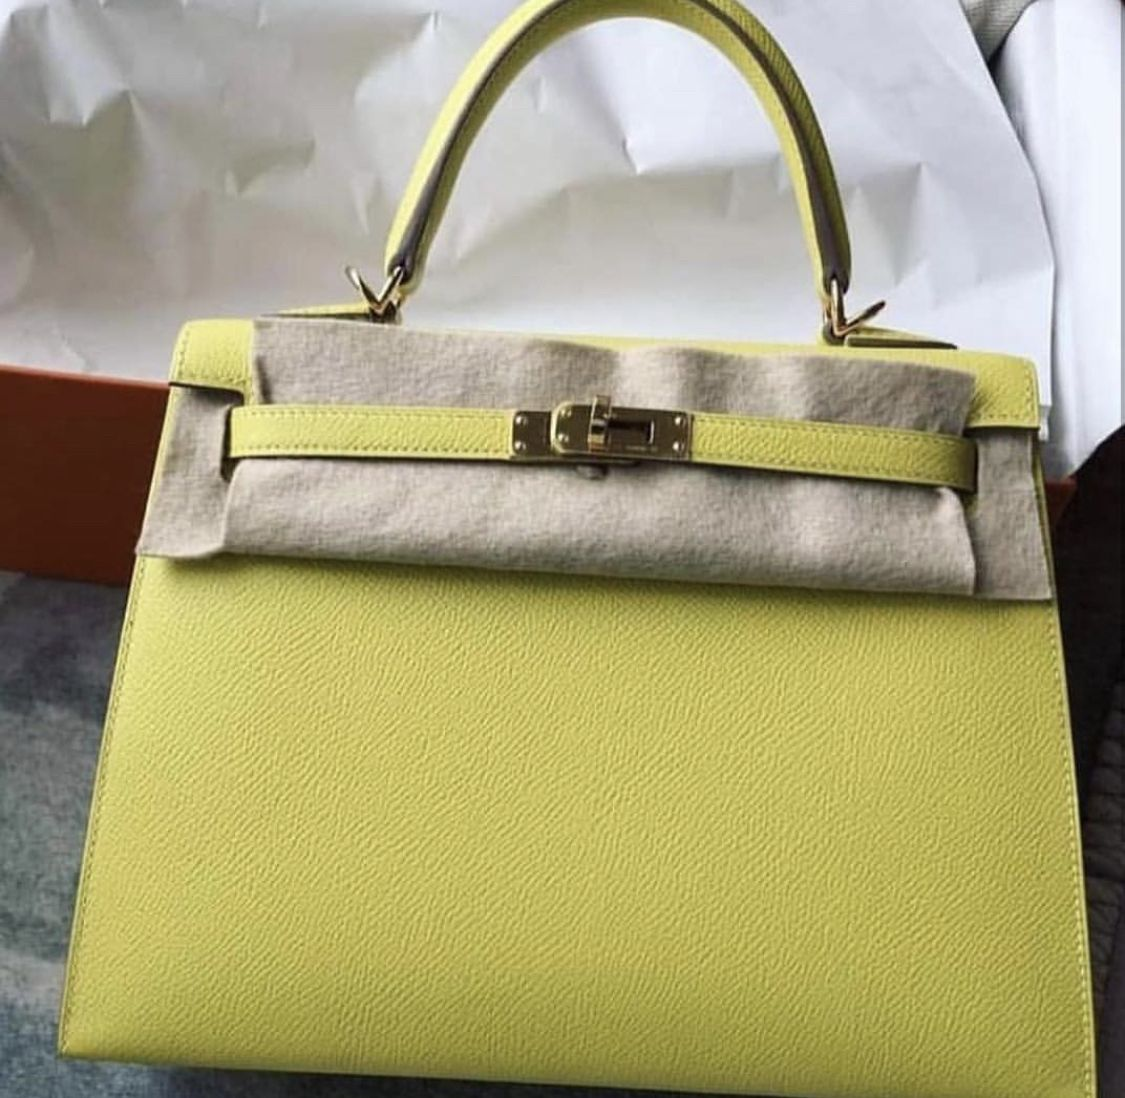 4646a58f0b60 Kelly 25 lime epsom Sellier phw  k25  hermes  kelly  epsom  lime  fashion   guru  trend  style  colors  bags  handbags  present  gift  saudi  asia